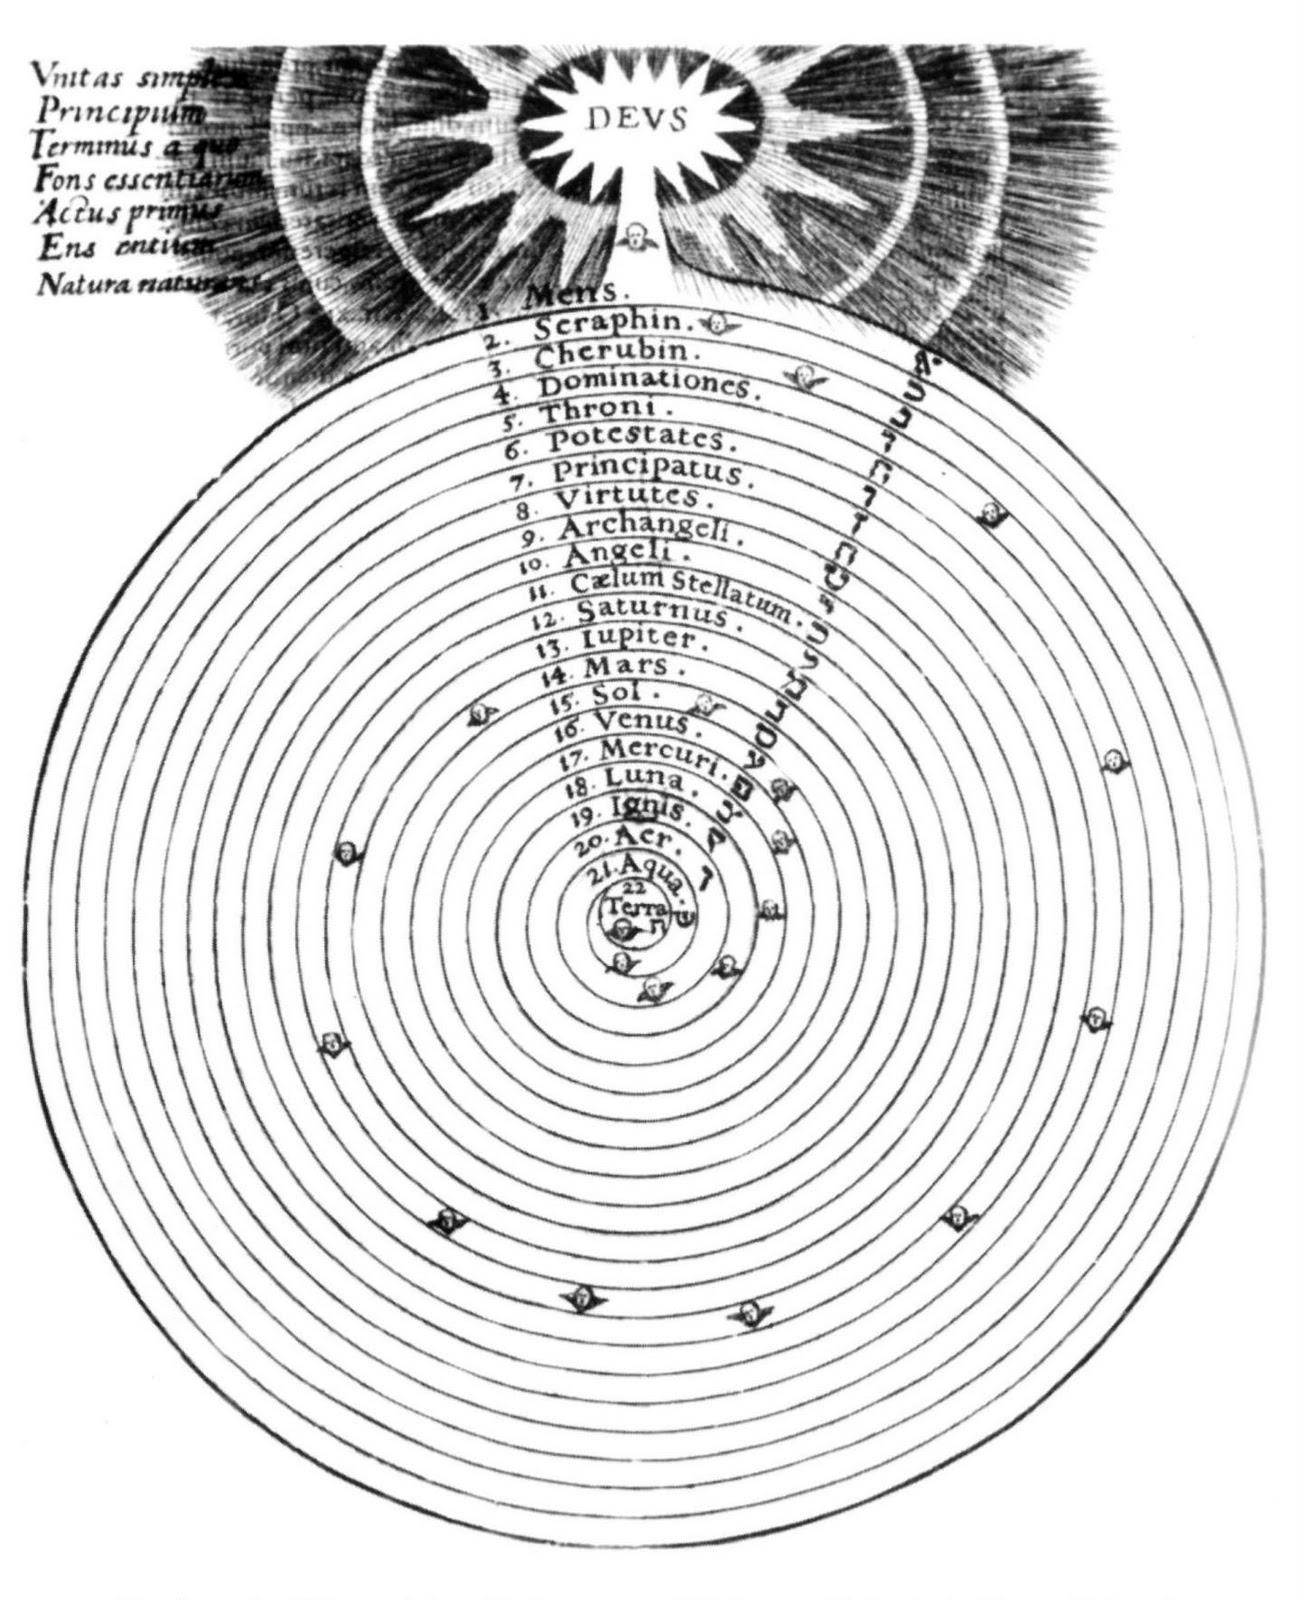 Mythopoeic Rambling Example Of A Celestial Hierarchy